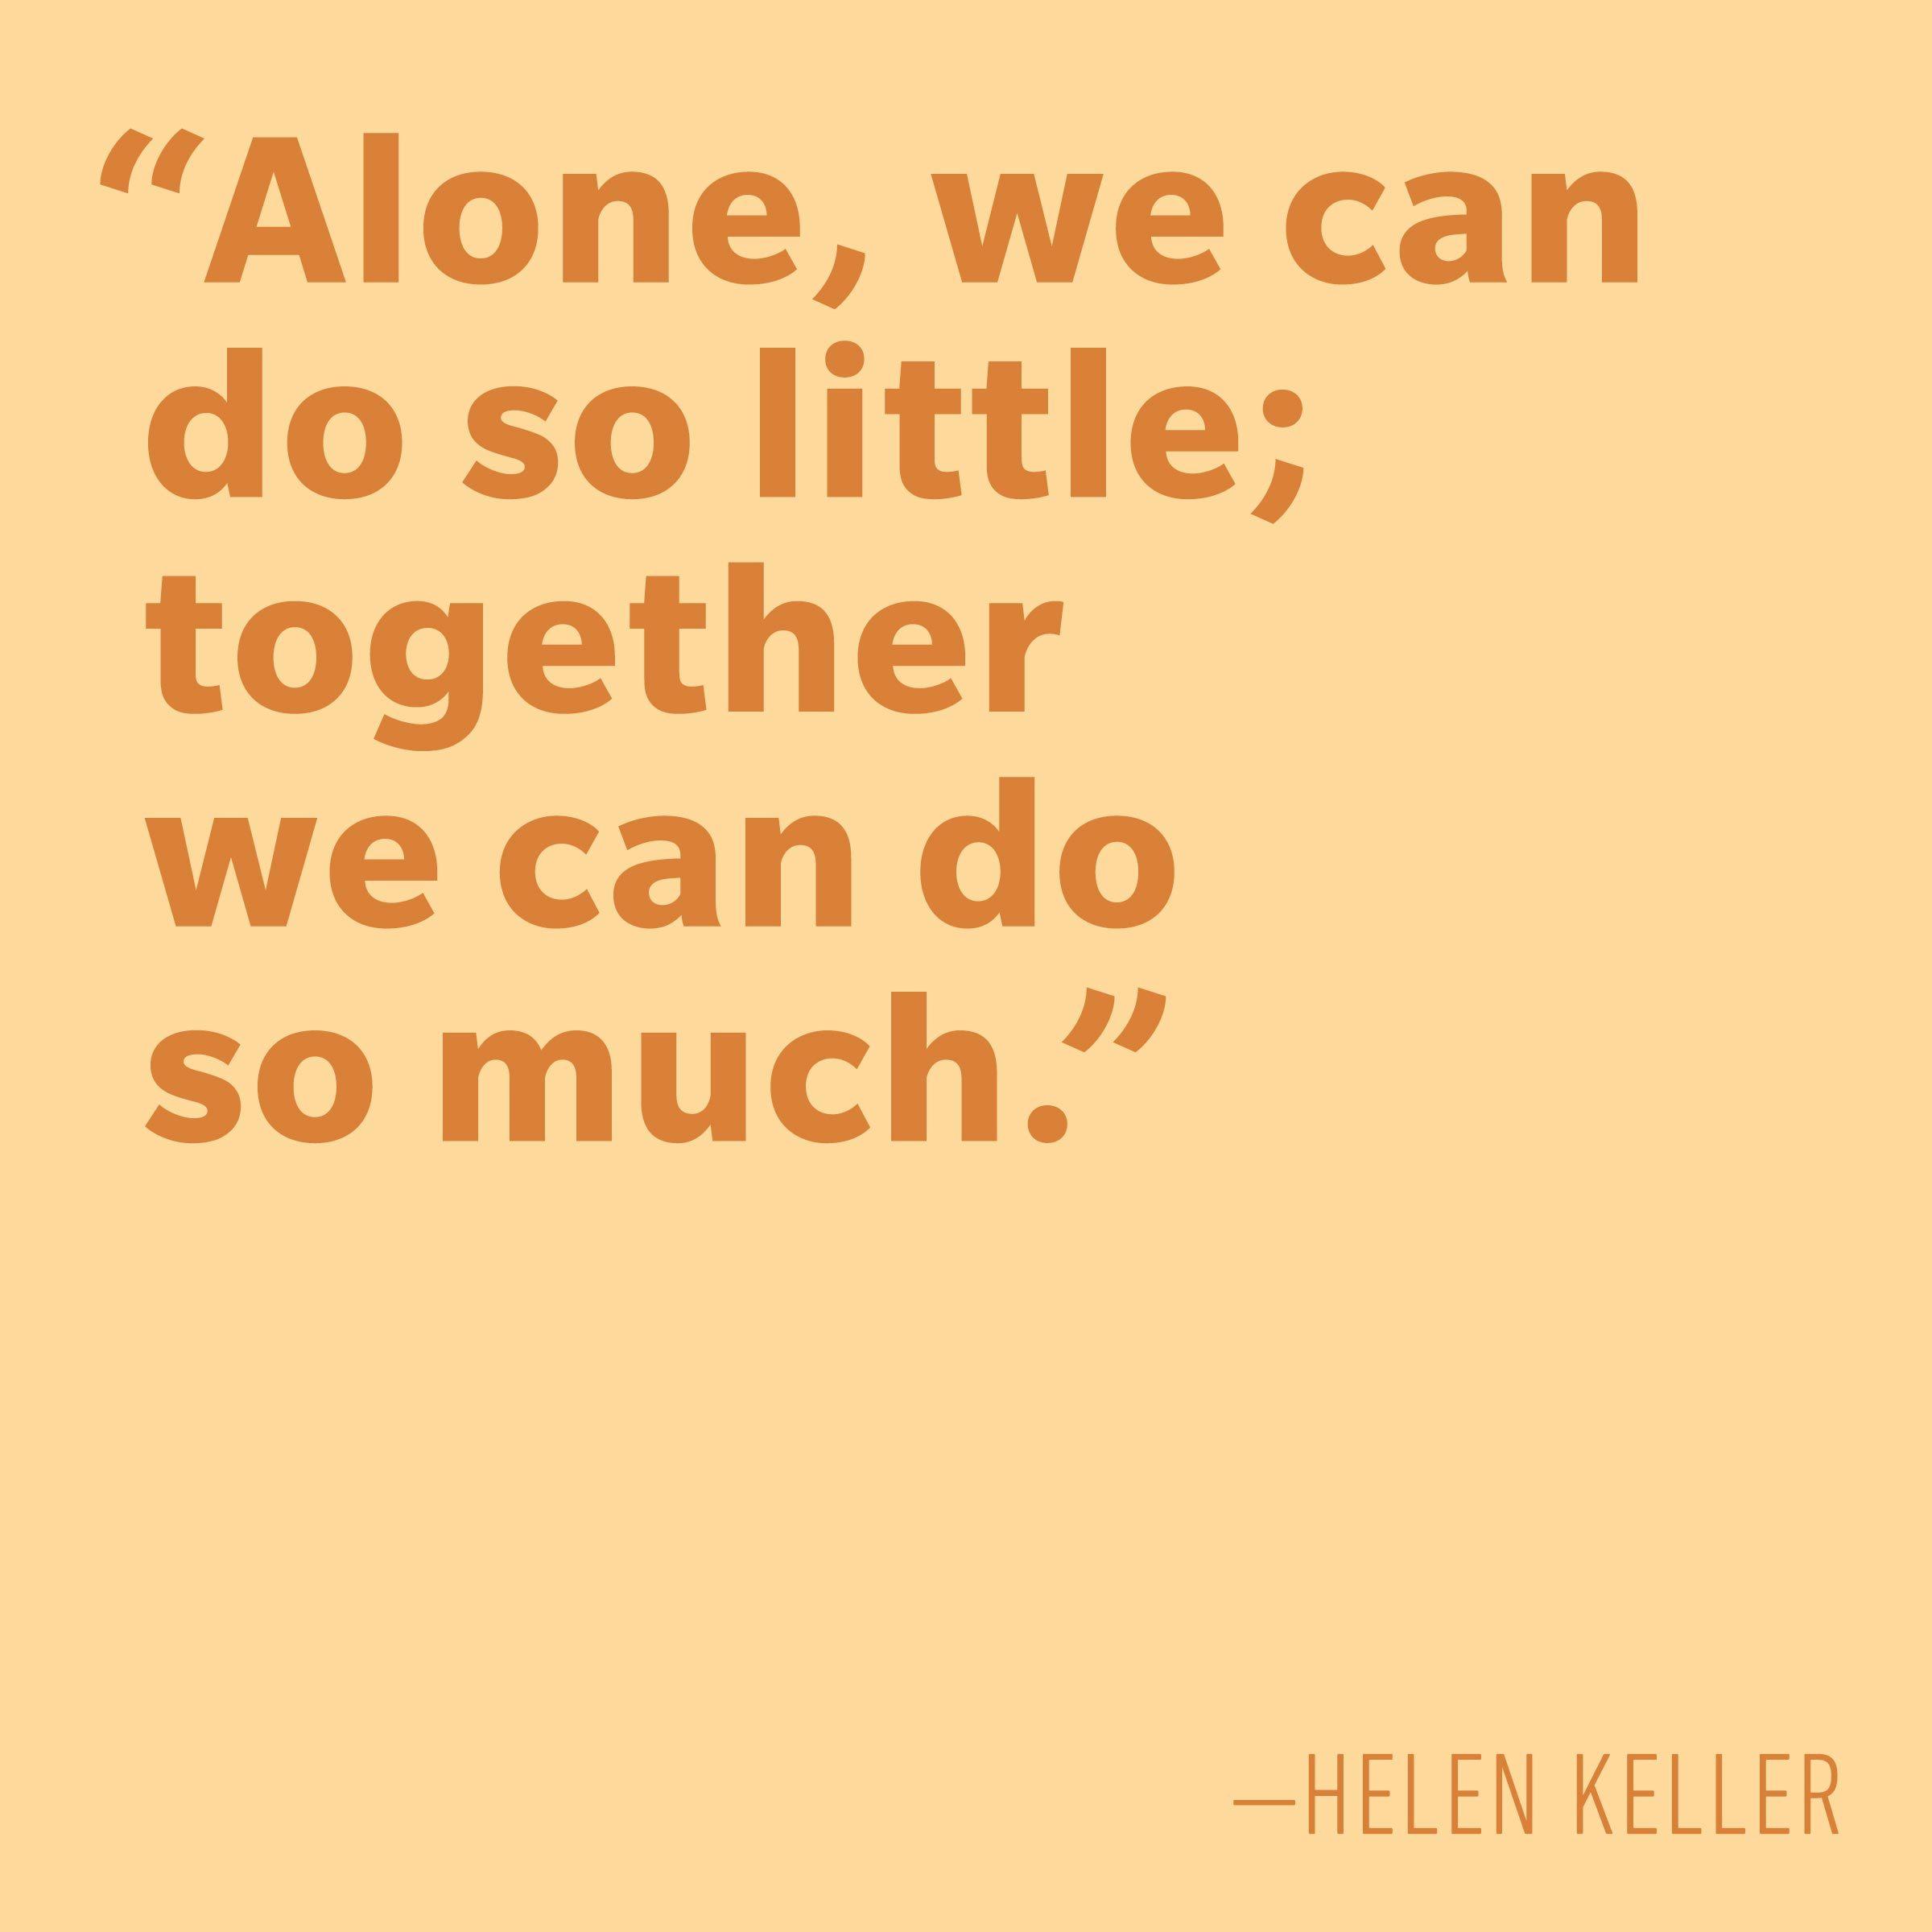 Motivational quotes - Helen Keller